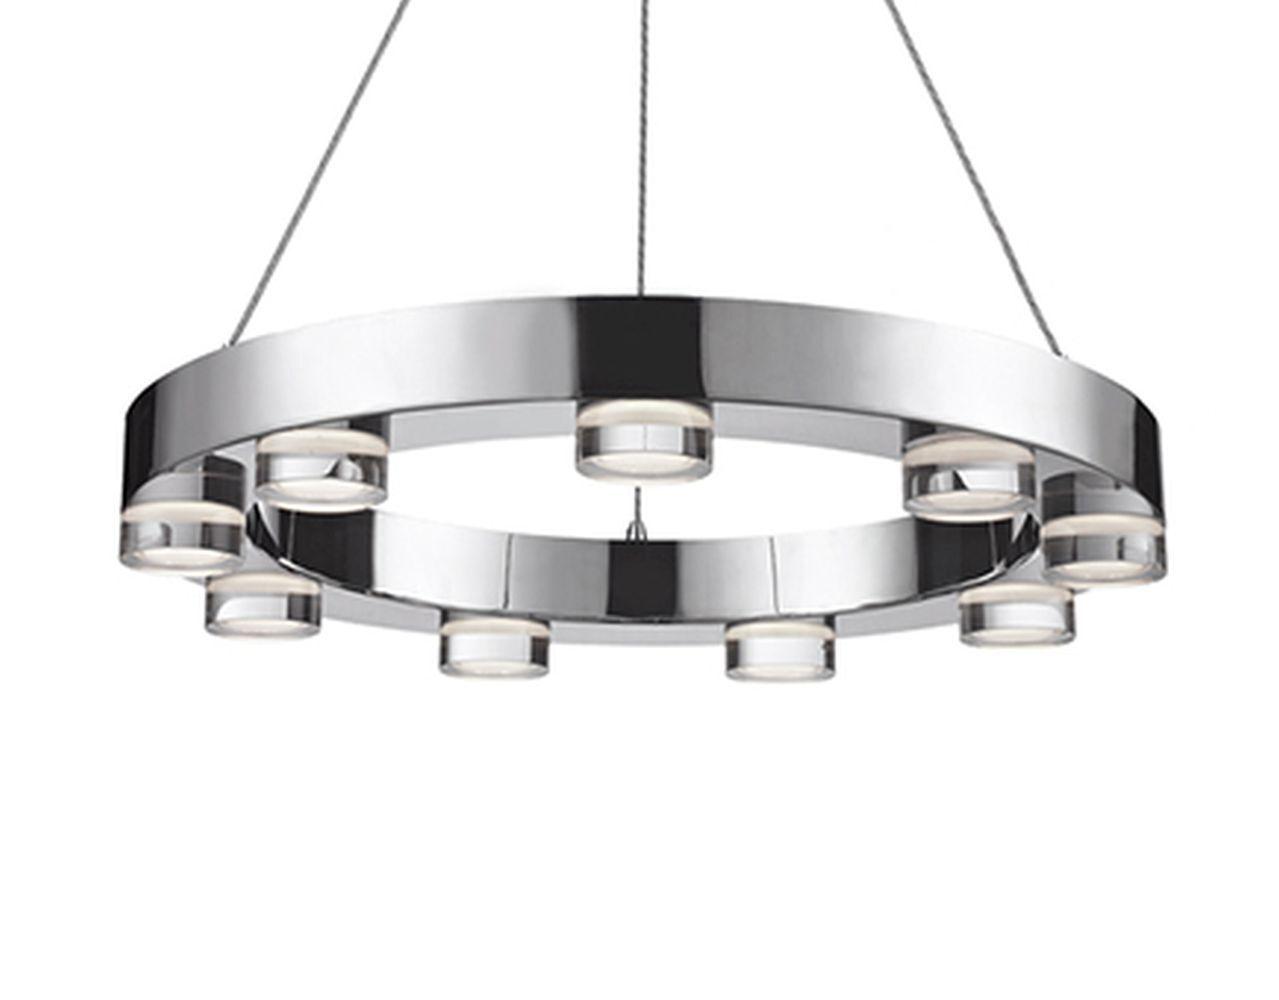 Mackenzie 9-Light LED Wagon Wheel Chandelier